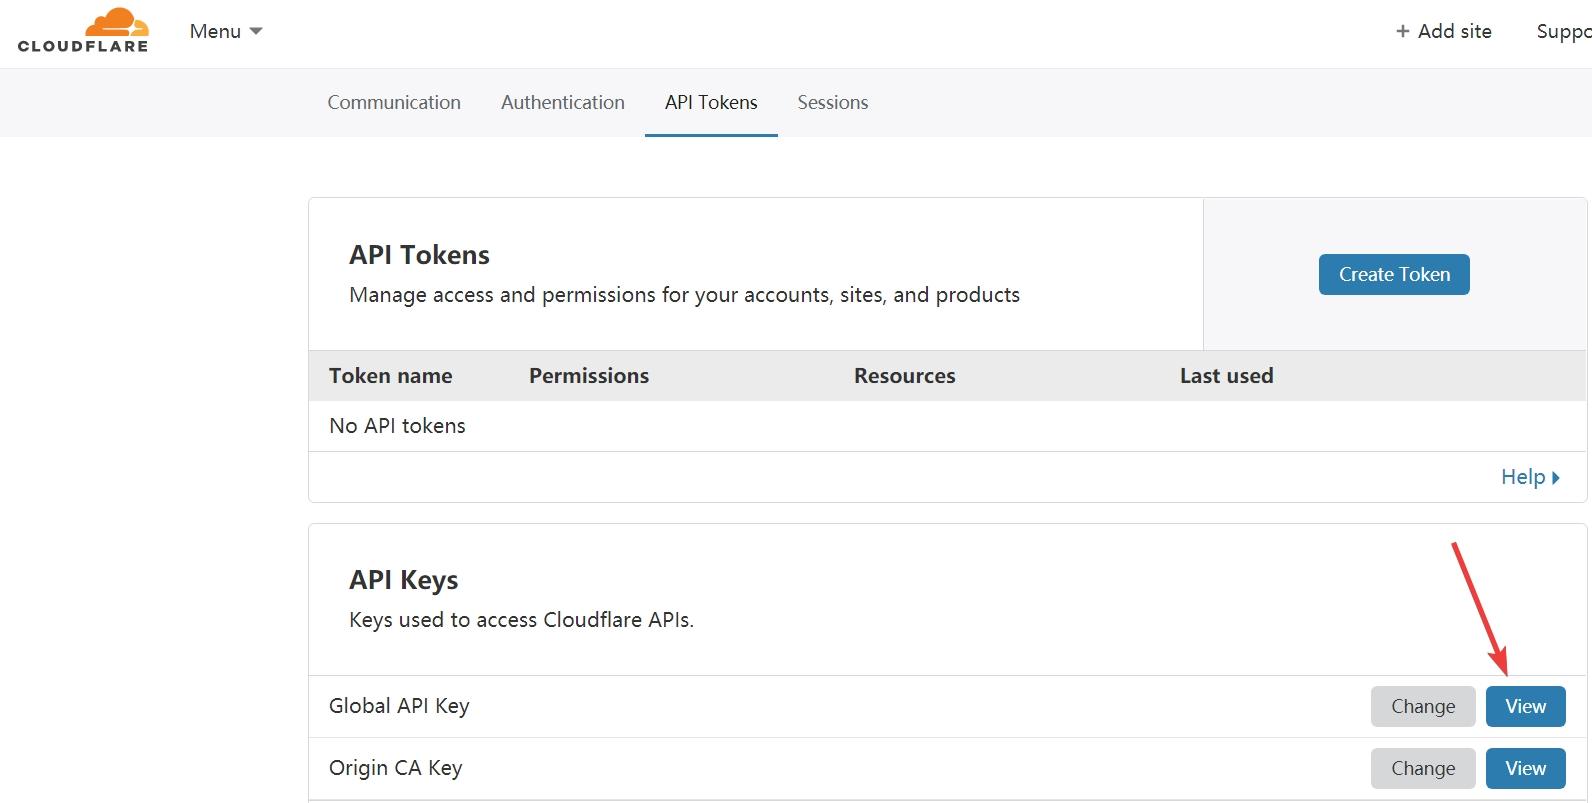 chrome_生成Global API Key.jpg